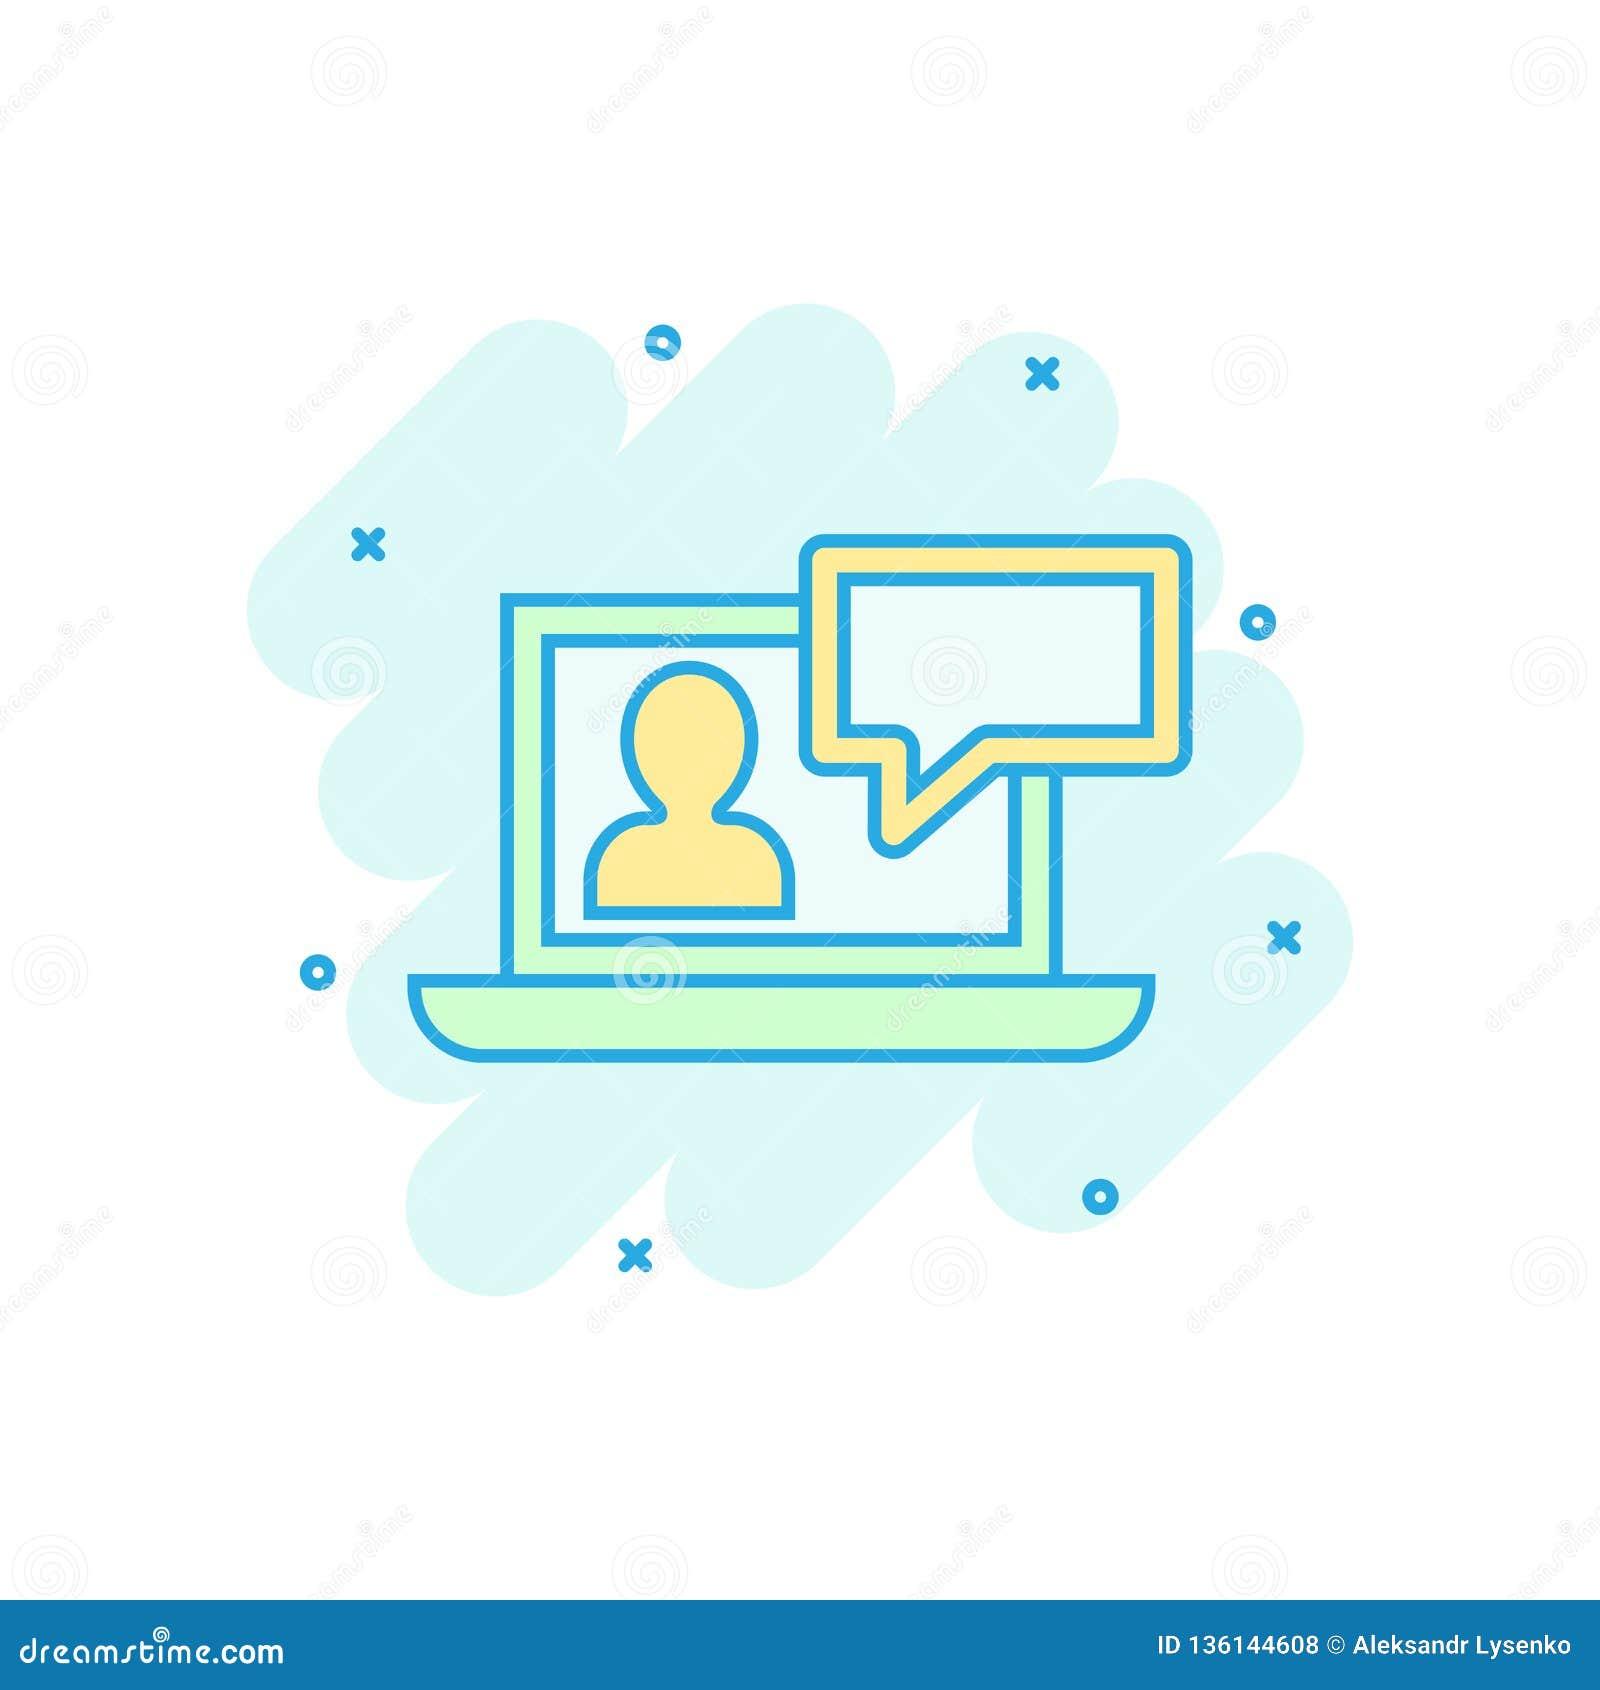 Online training process icon in comic style webinar seminar vector cartoon illustration pictogram e learning business concept splash effect